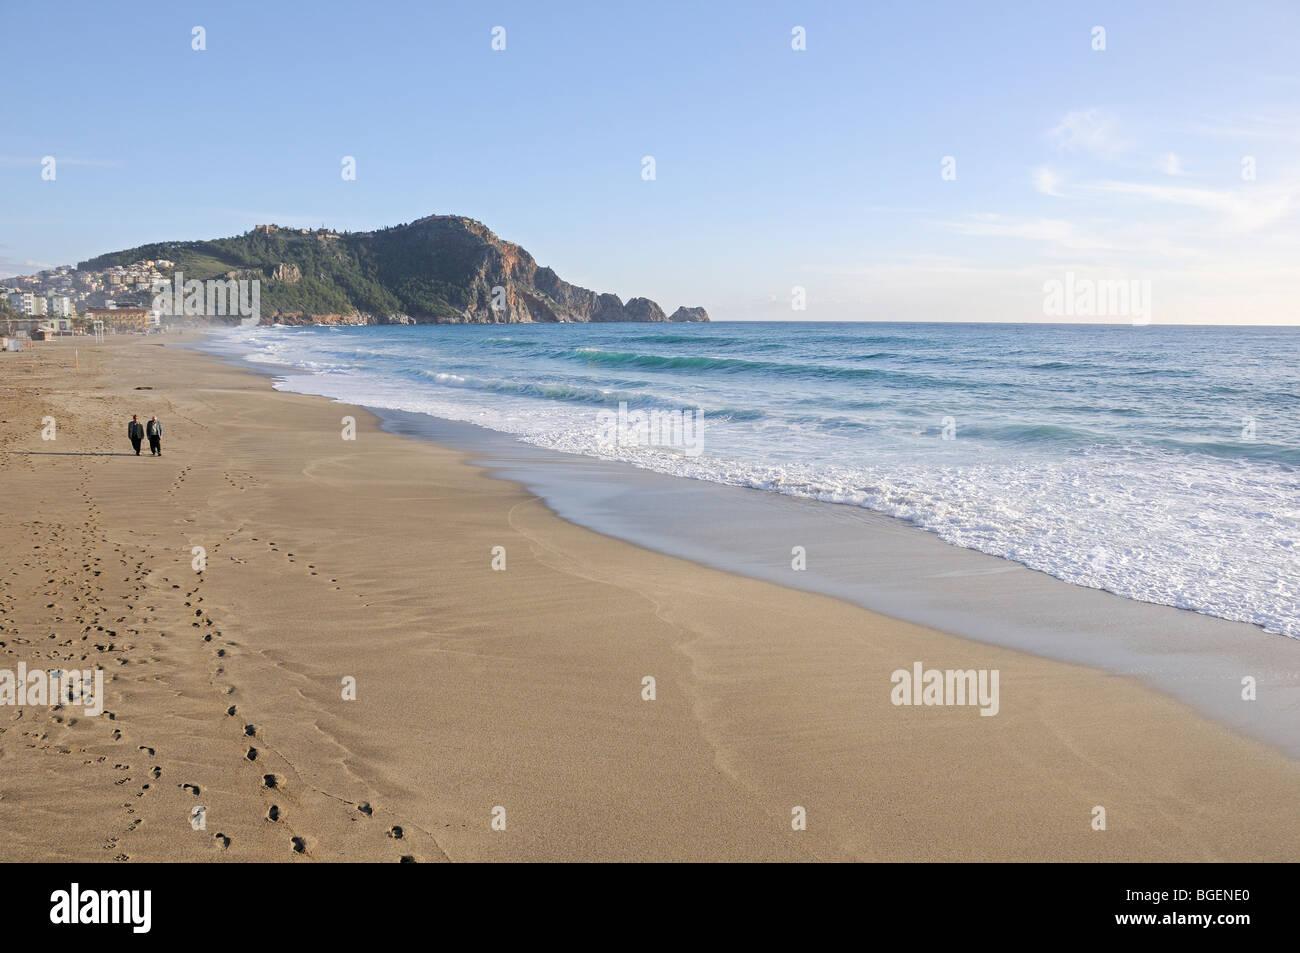 people walking at the Cleopatra Beach of Alanya, Turkey, Türkiye, Alanya, Mediterranean Sea - Stock Image